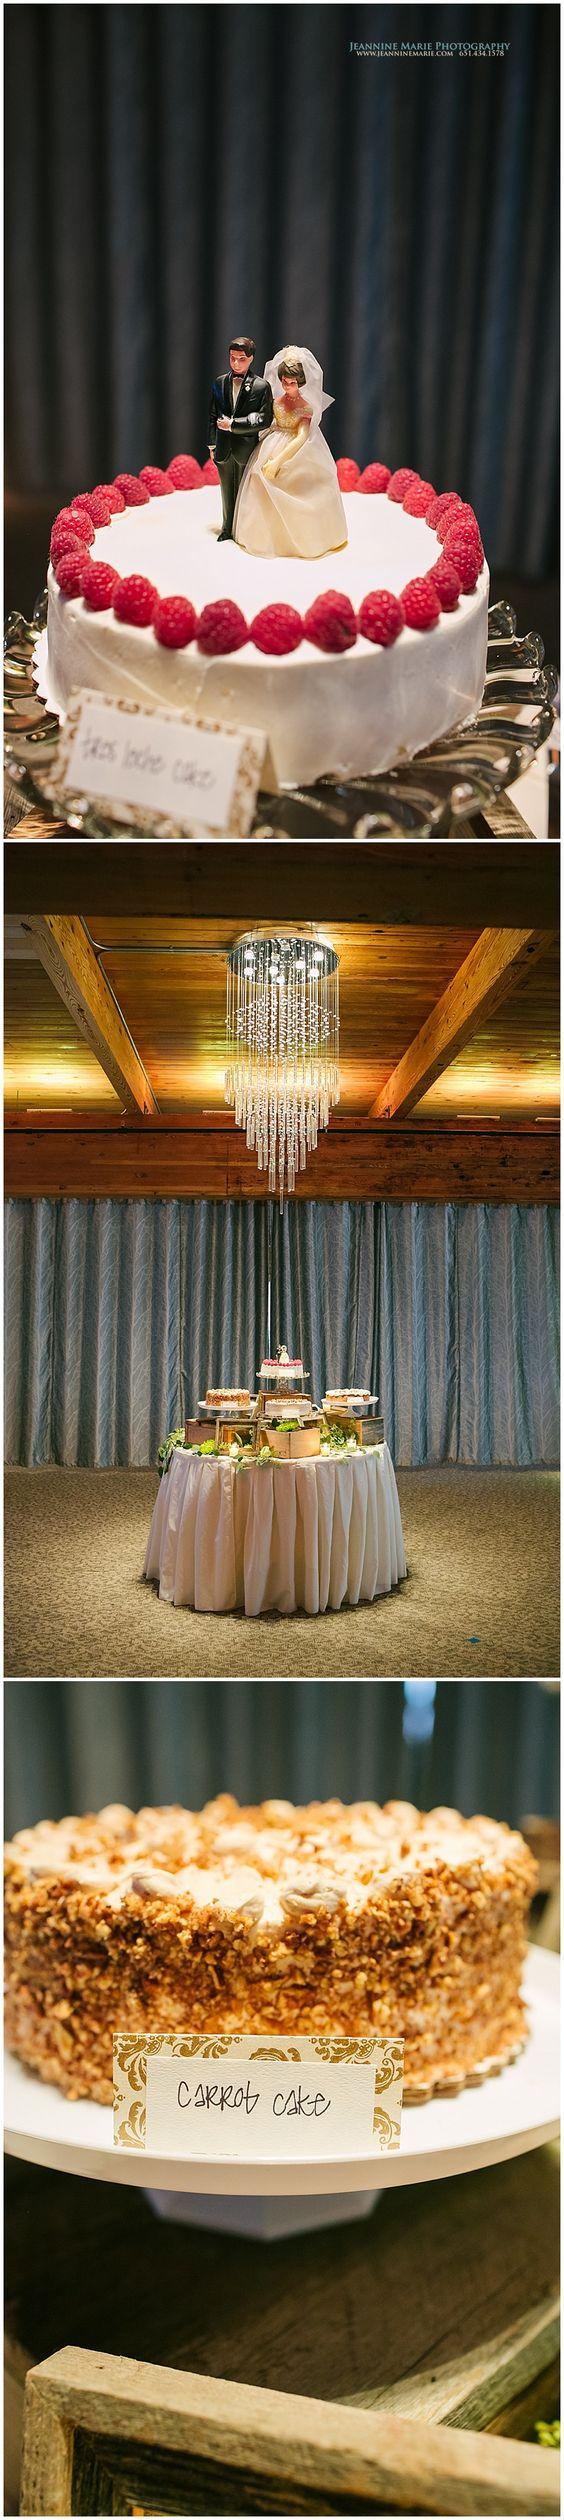 wedding halls st paul mn%0A Wedding desserts designed by Cafe Latte  Twin Cities wedding baker  at  A u    BULAE